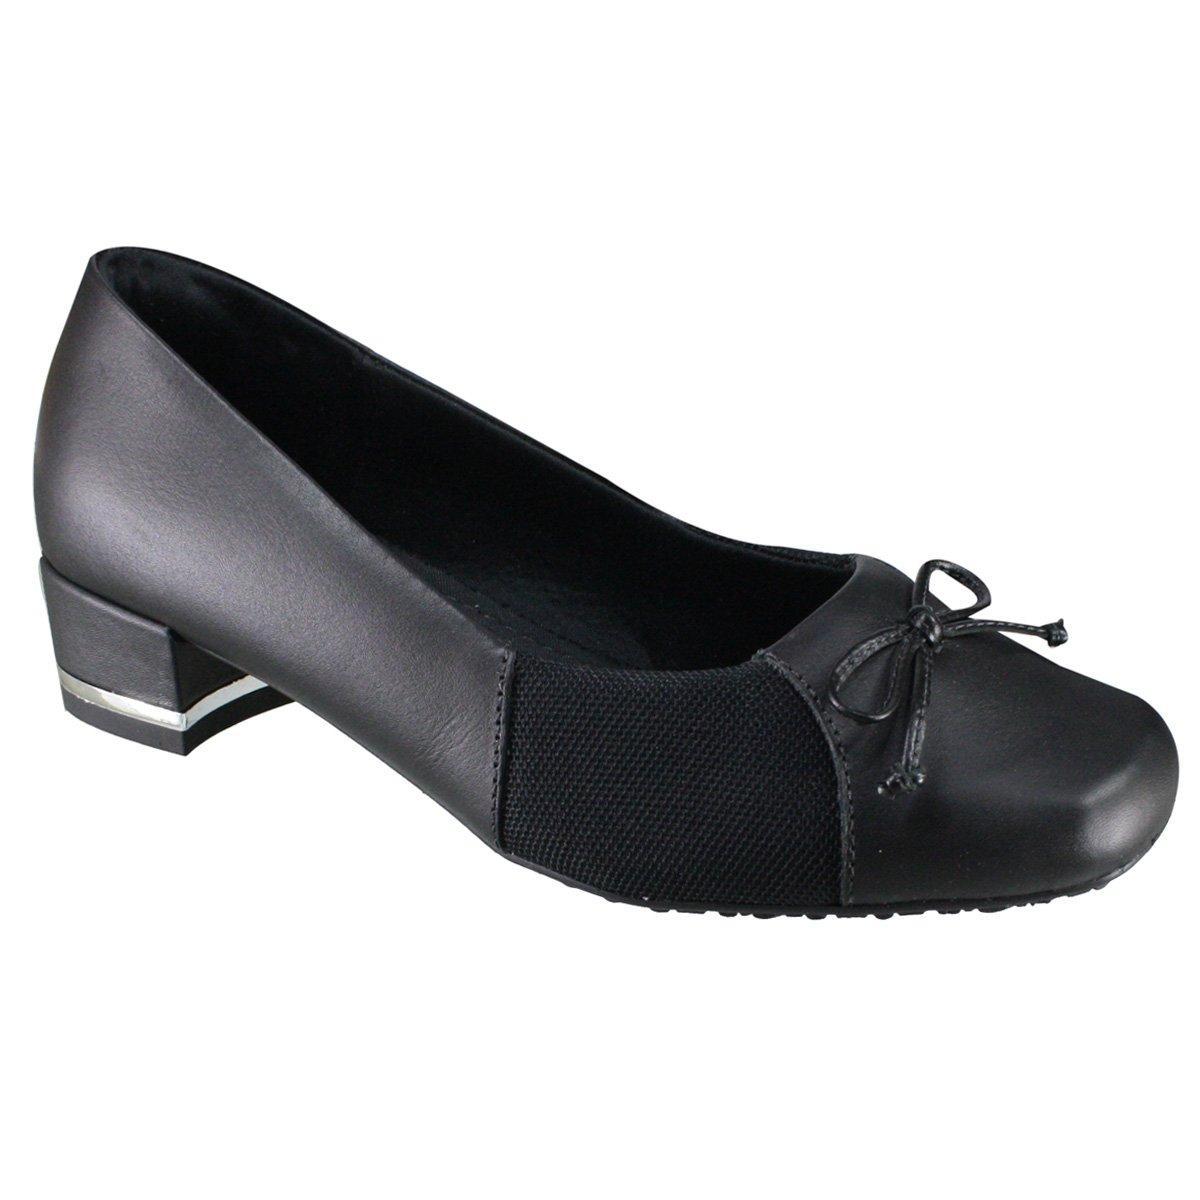 b4a82fe43b Sapato Feminino Usaflex Care Hidratante Z5809-1 - Preto (Soft Slim ...